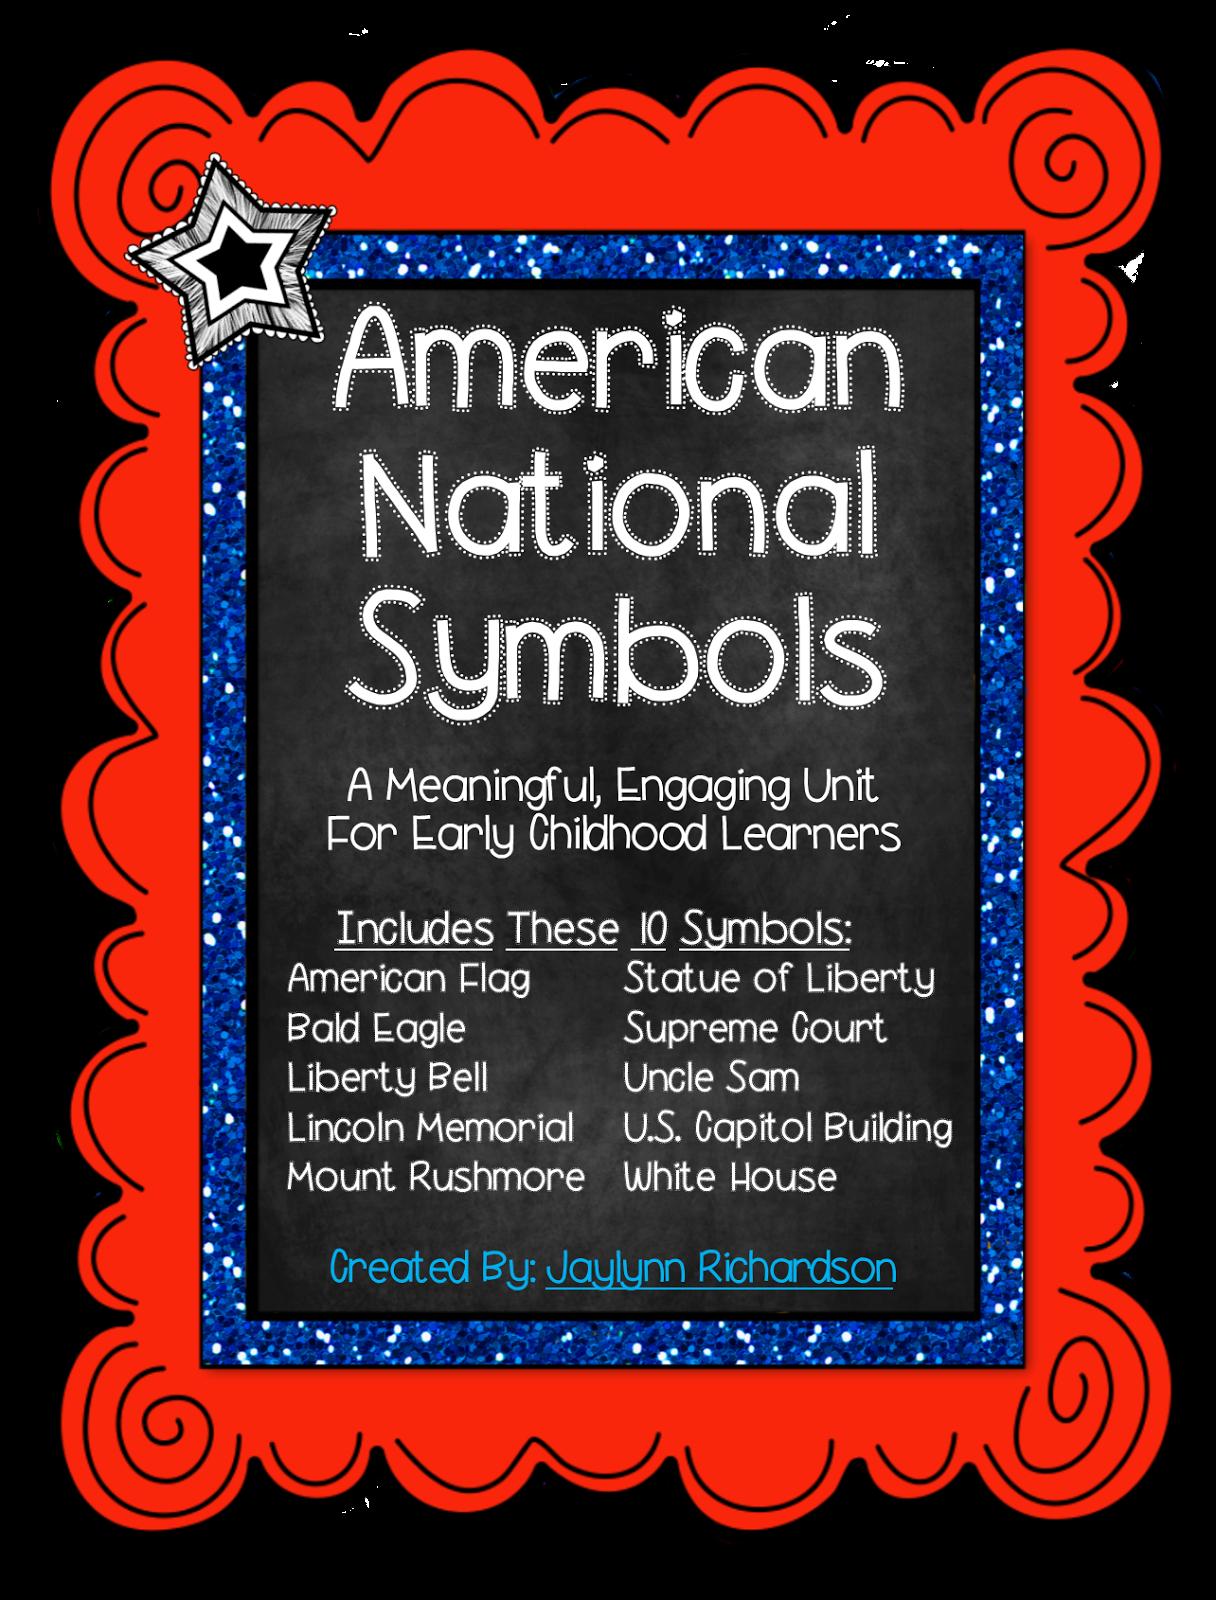 American National Symbols The Best of Tea...